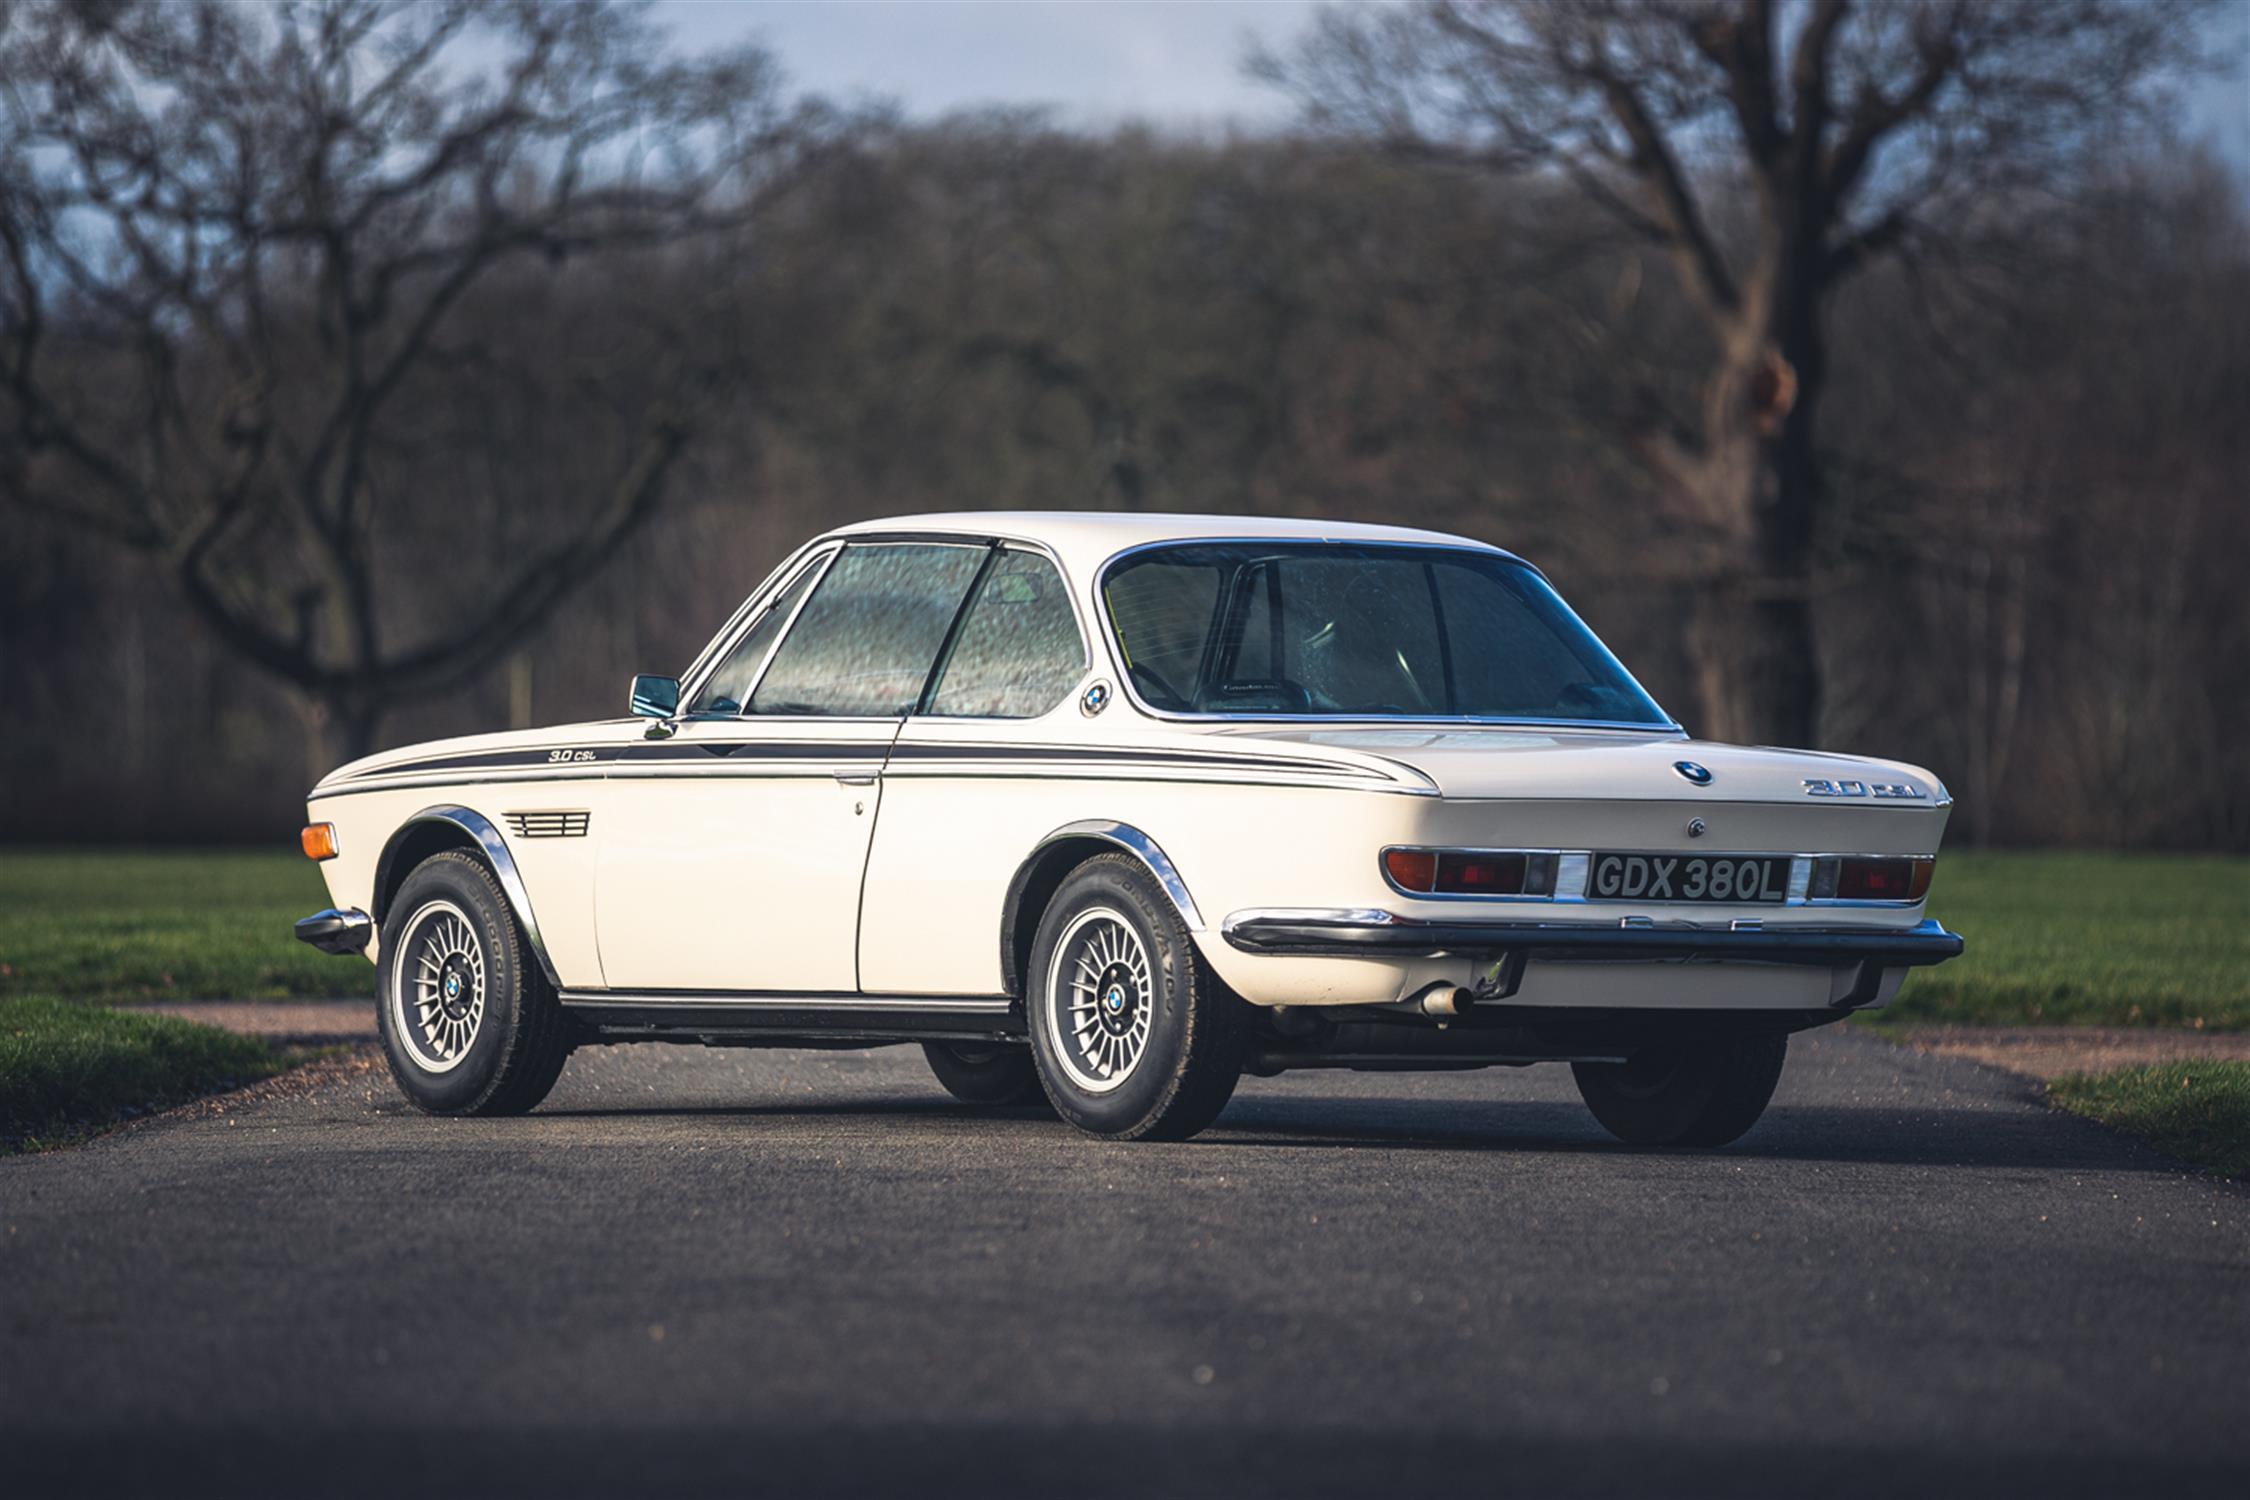 1973 BMW 3.0 CSL - Image 3 of 10